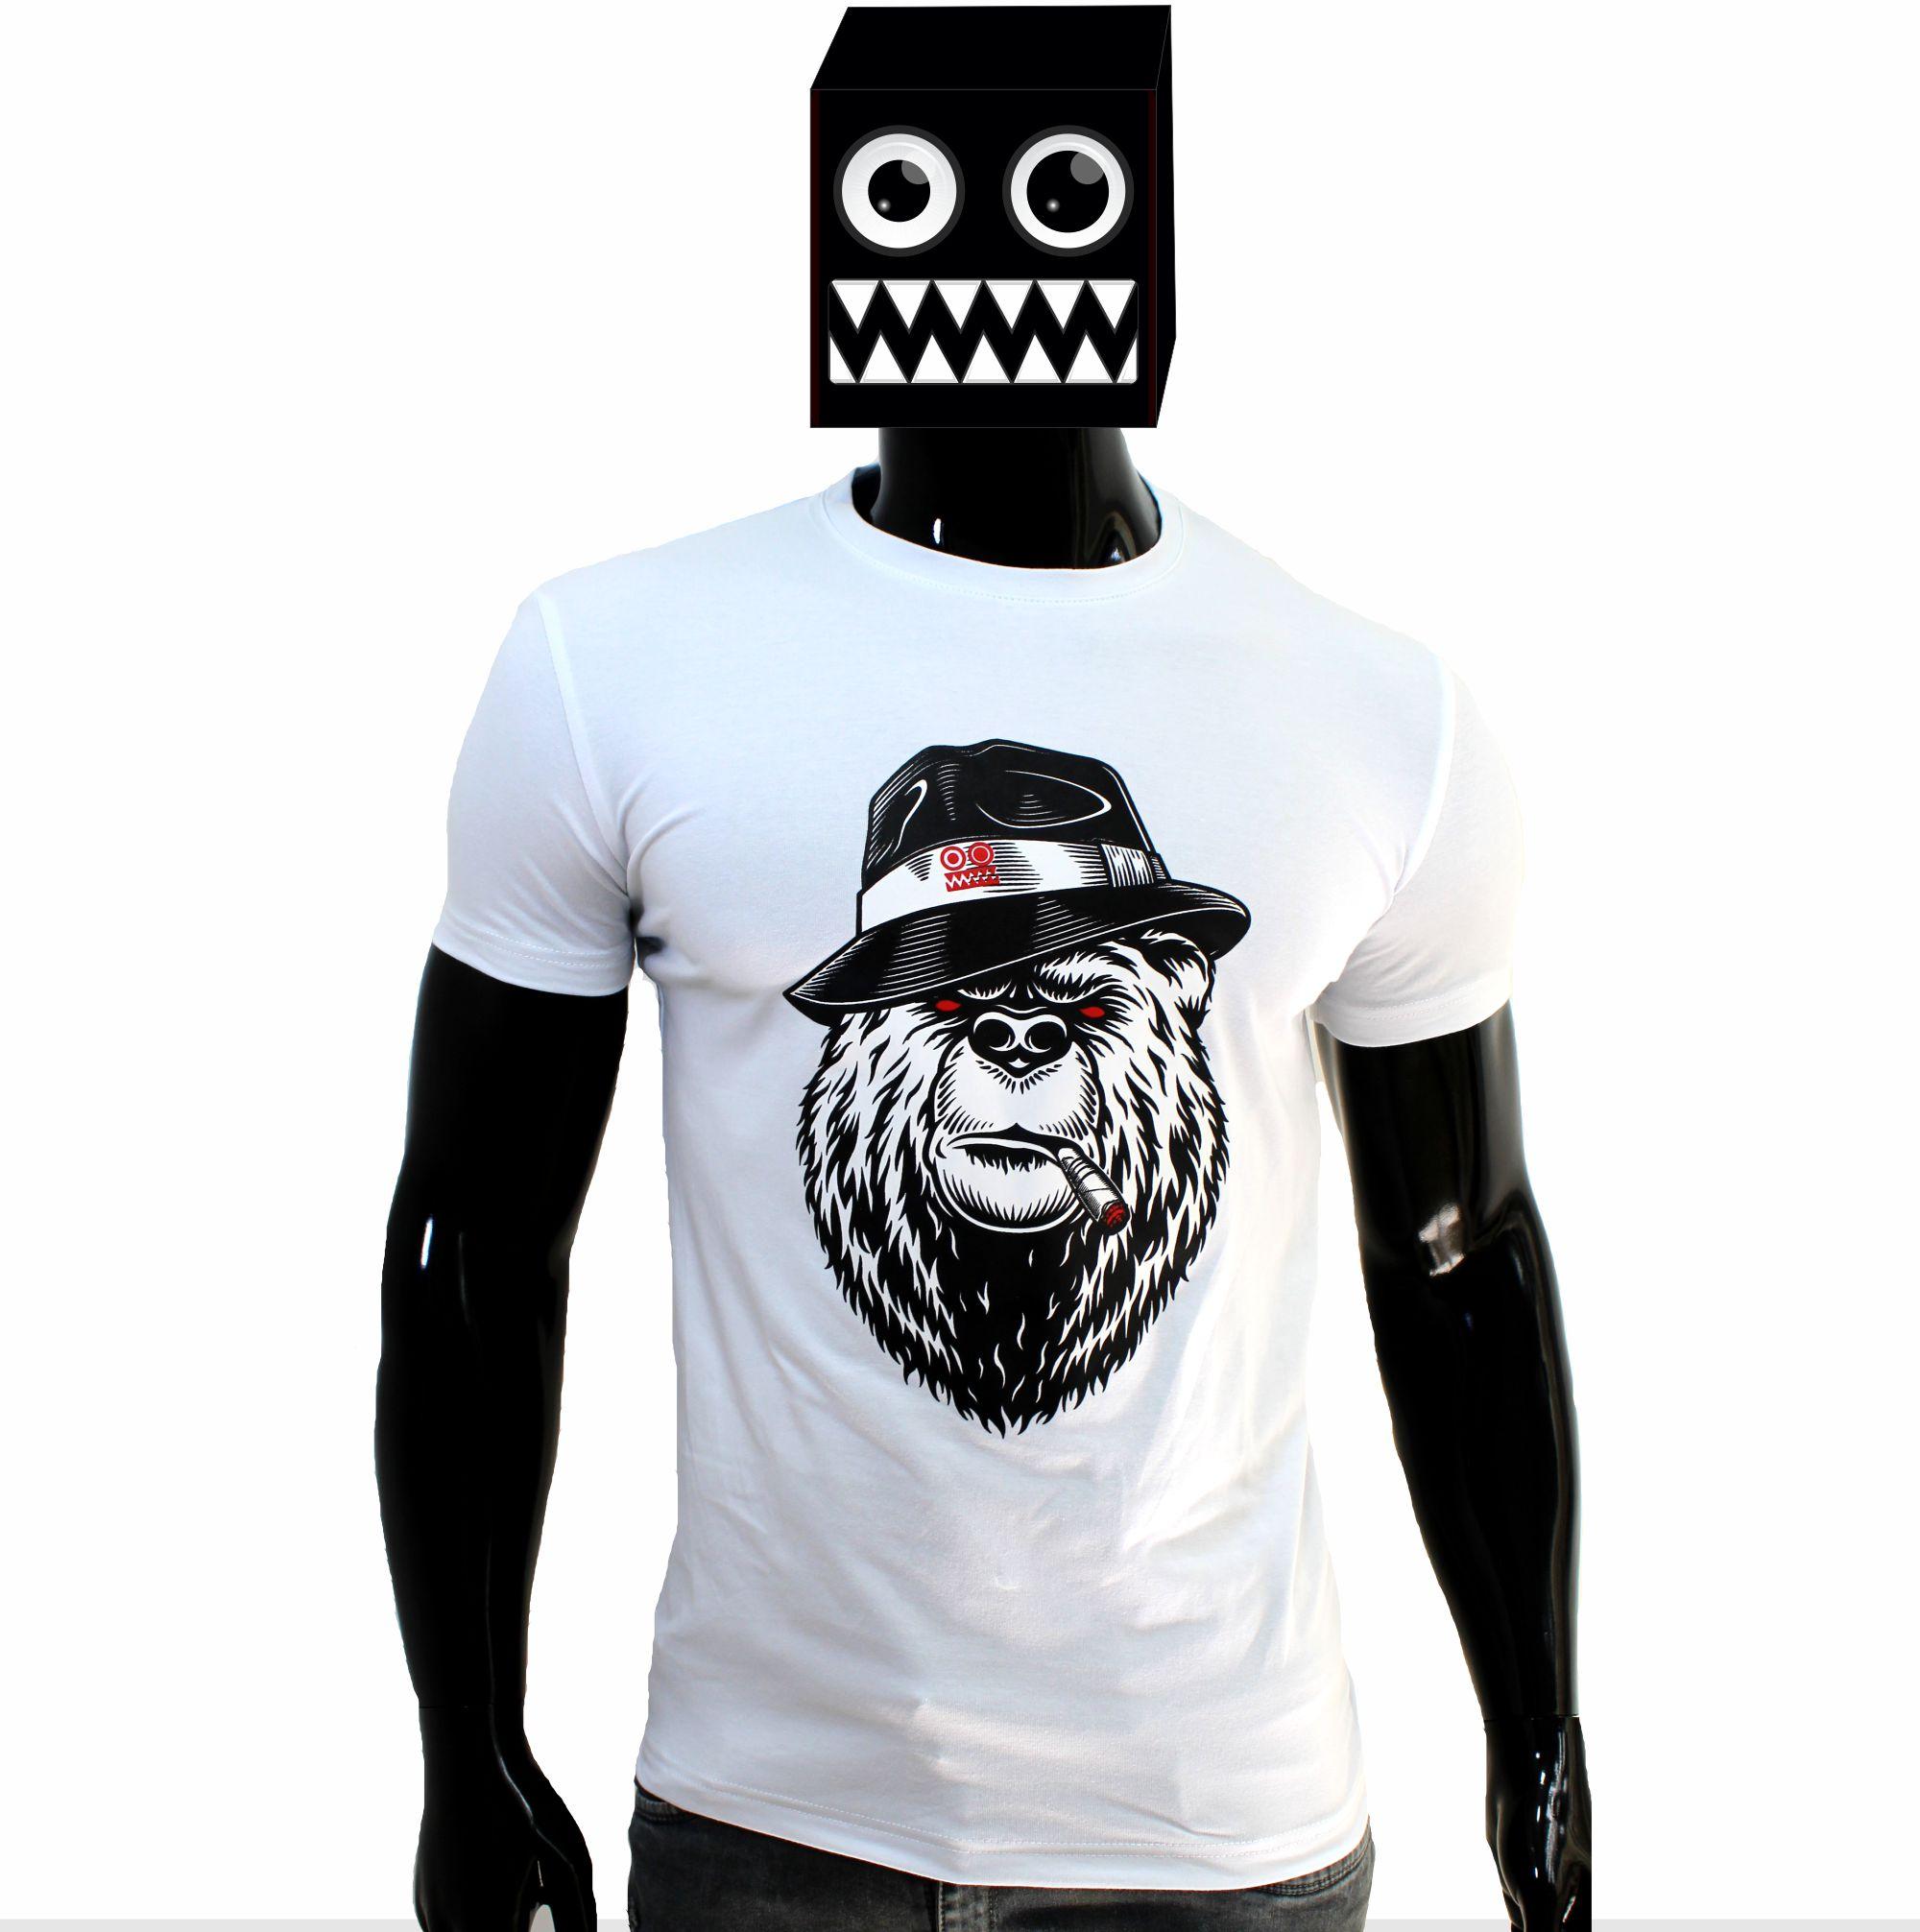 ref 1634  camiseta blanco osos fumando, tela en algodón expande.